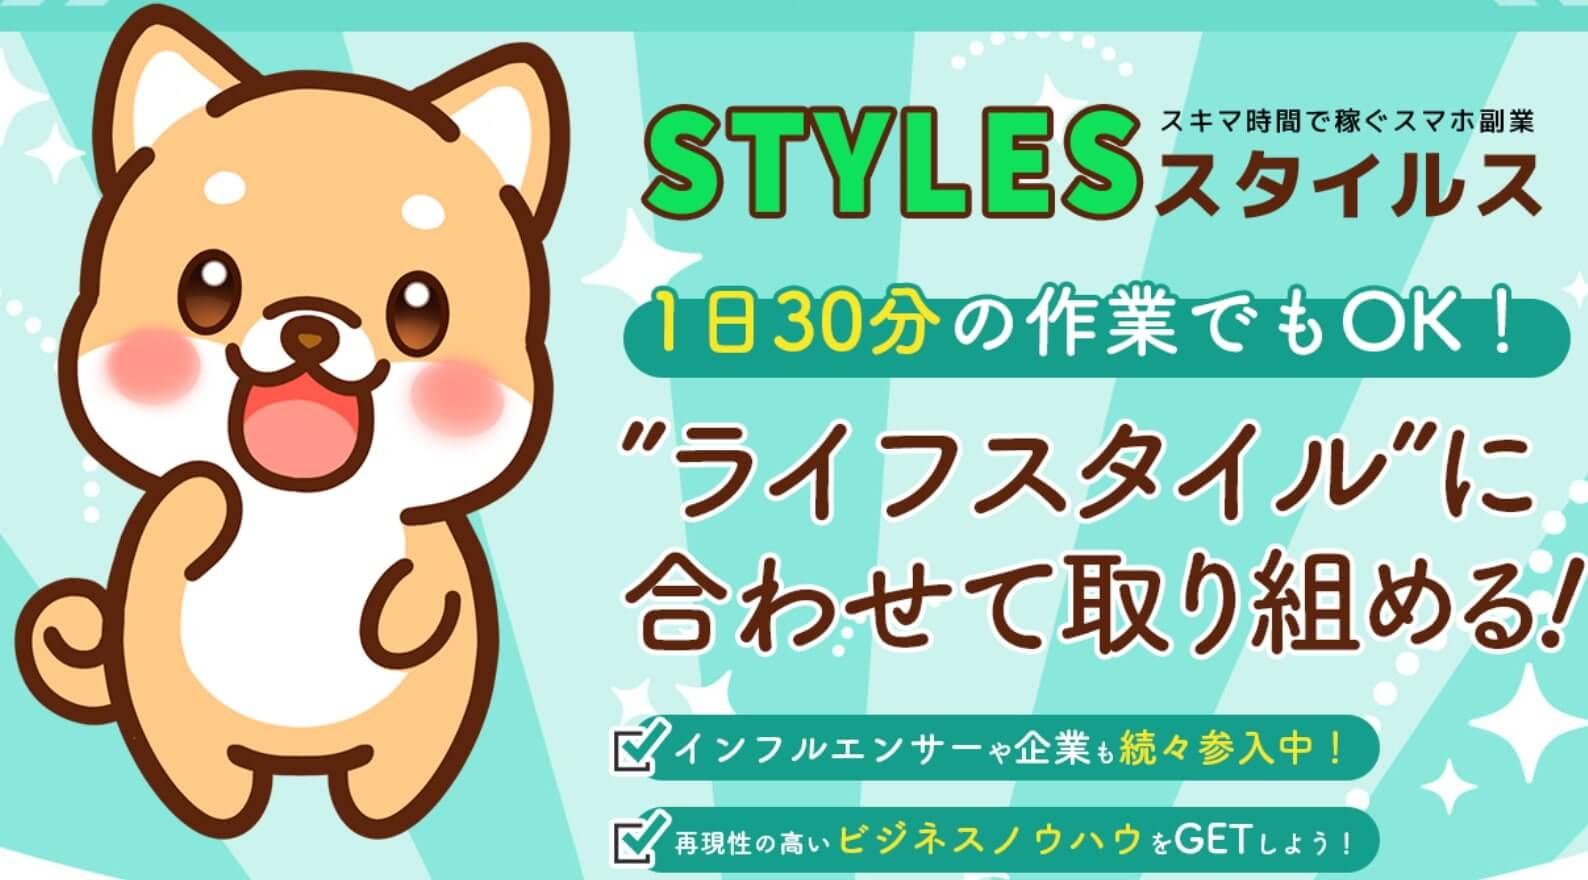 Styles(スタイルス)